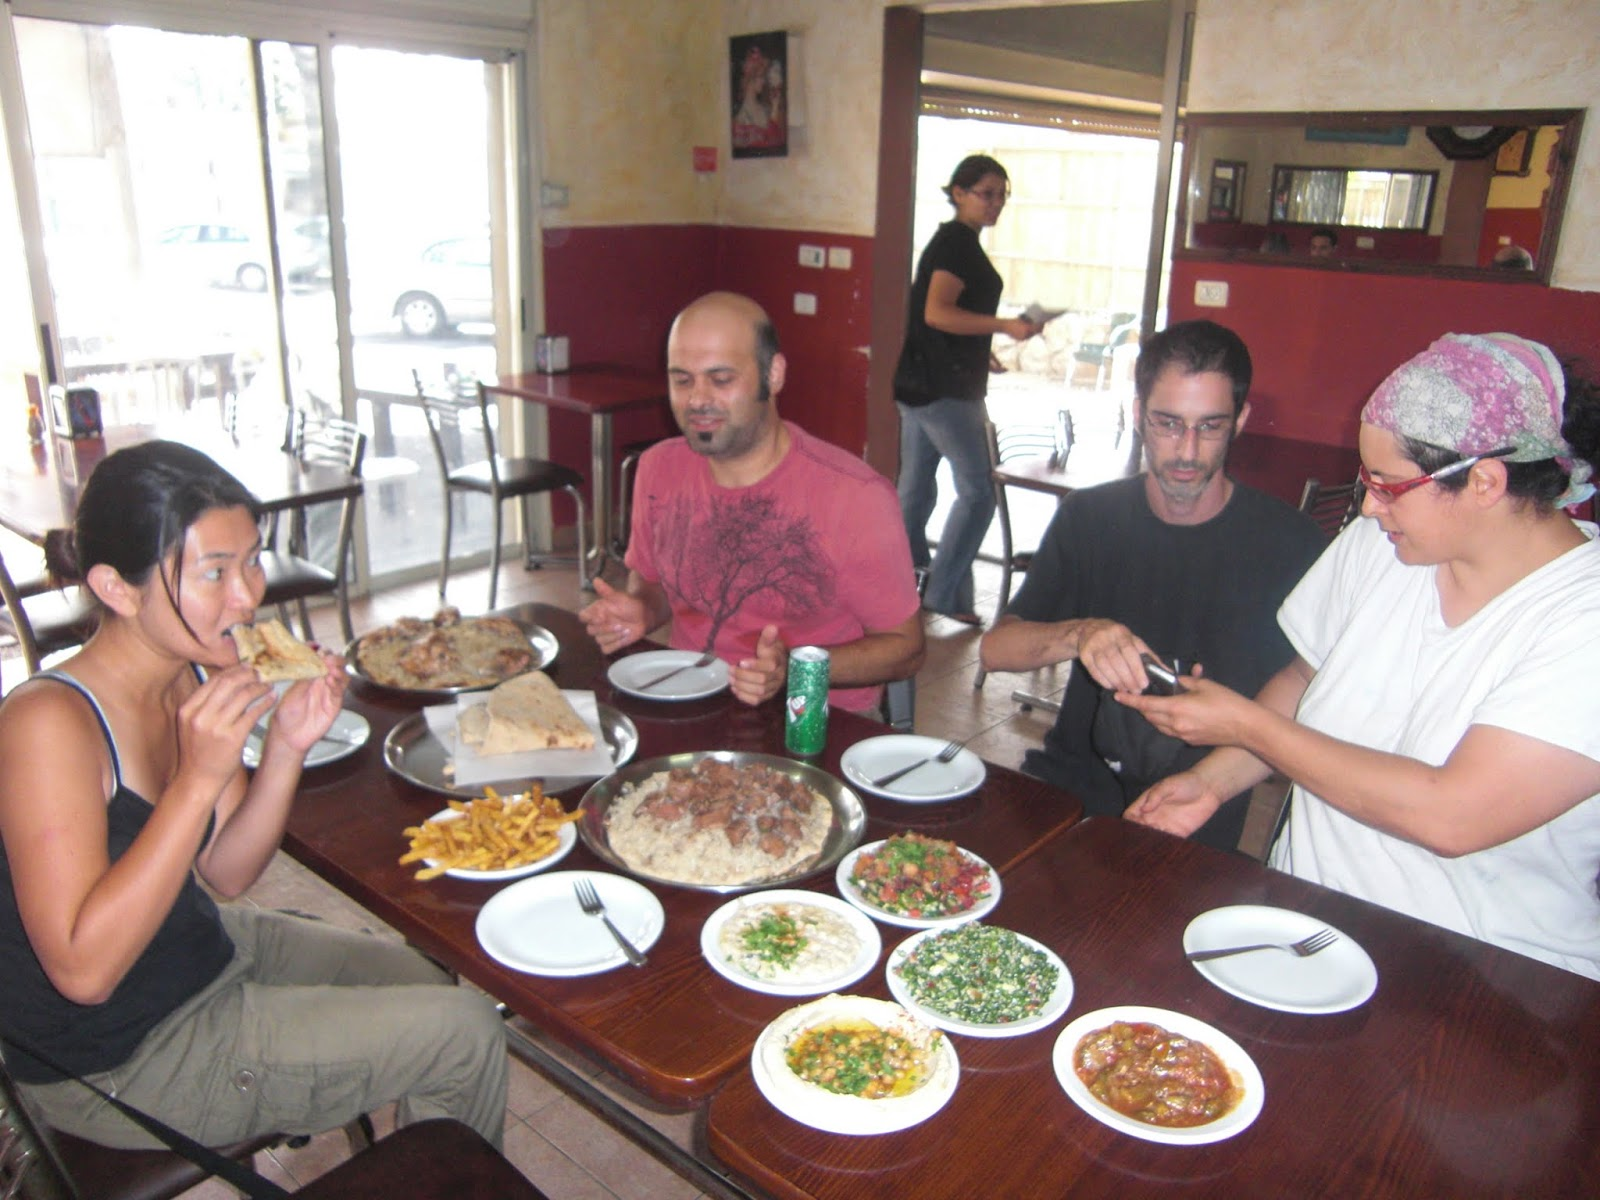 BenkyonoBen: Haifa, Hadas and Sruli Pictures Kibbutz Hahotrim